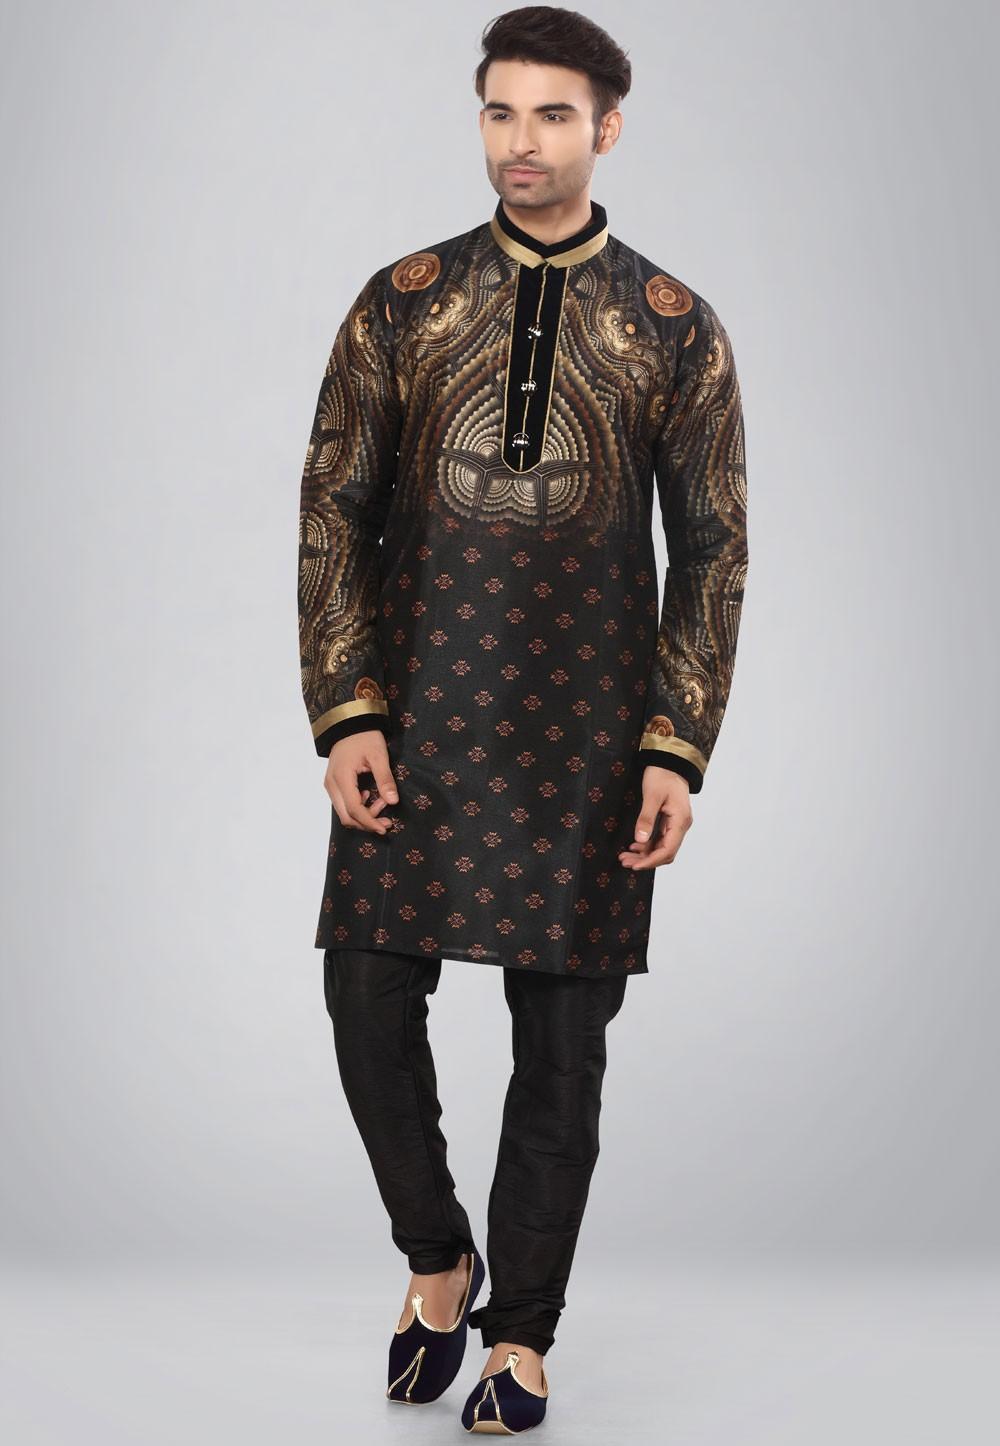 Black,Golden Color Dupion Silk Kurta Pajama.